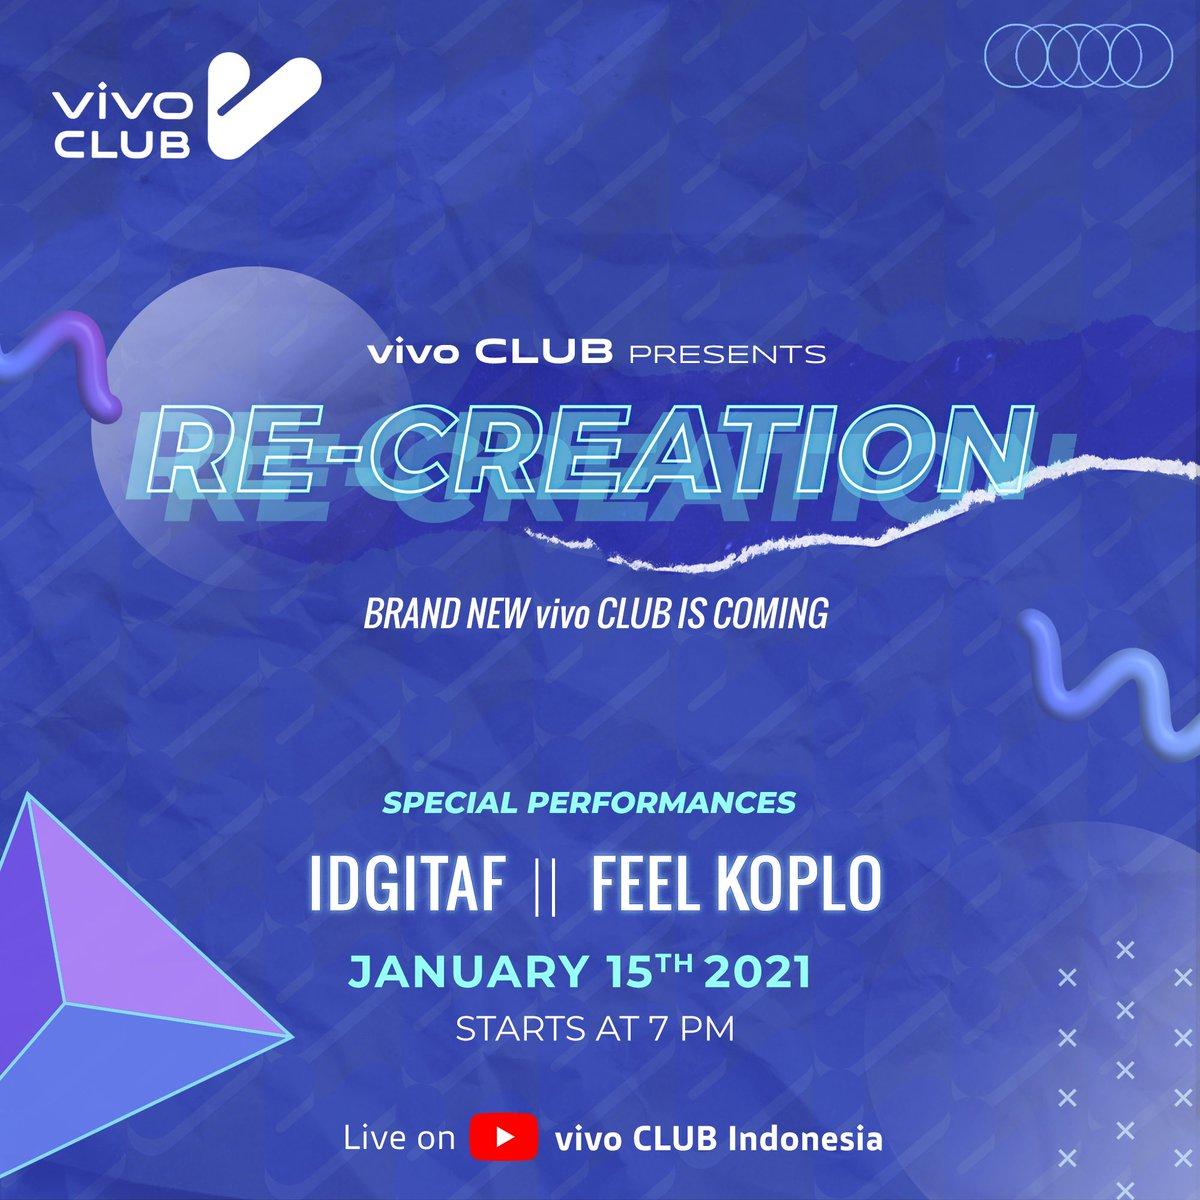 vivo CLUB Indonesia punya logo dan interface baru yang akan launching di Re-creation event pada hari Jumat, 15 Januari 2021, jam 19.00 WIB.  Nantikan special performance dari @idgitaf dan @feelkoplo ya! Live di YouTube vivo CLUB Indonesia. #vivoCLUBIndonesia #vivoACLUBRecreation